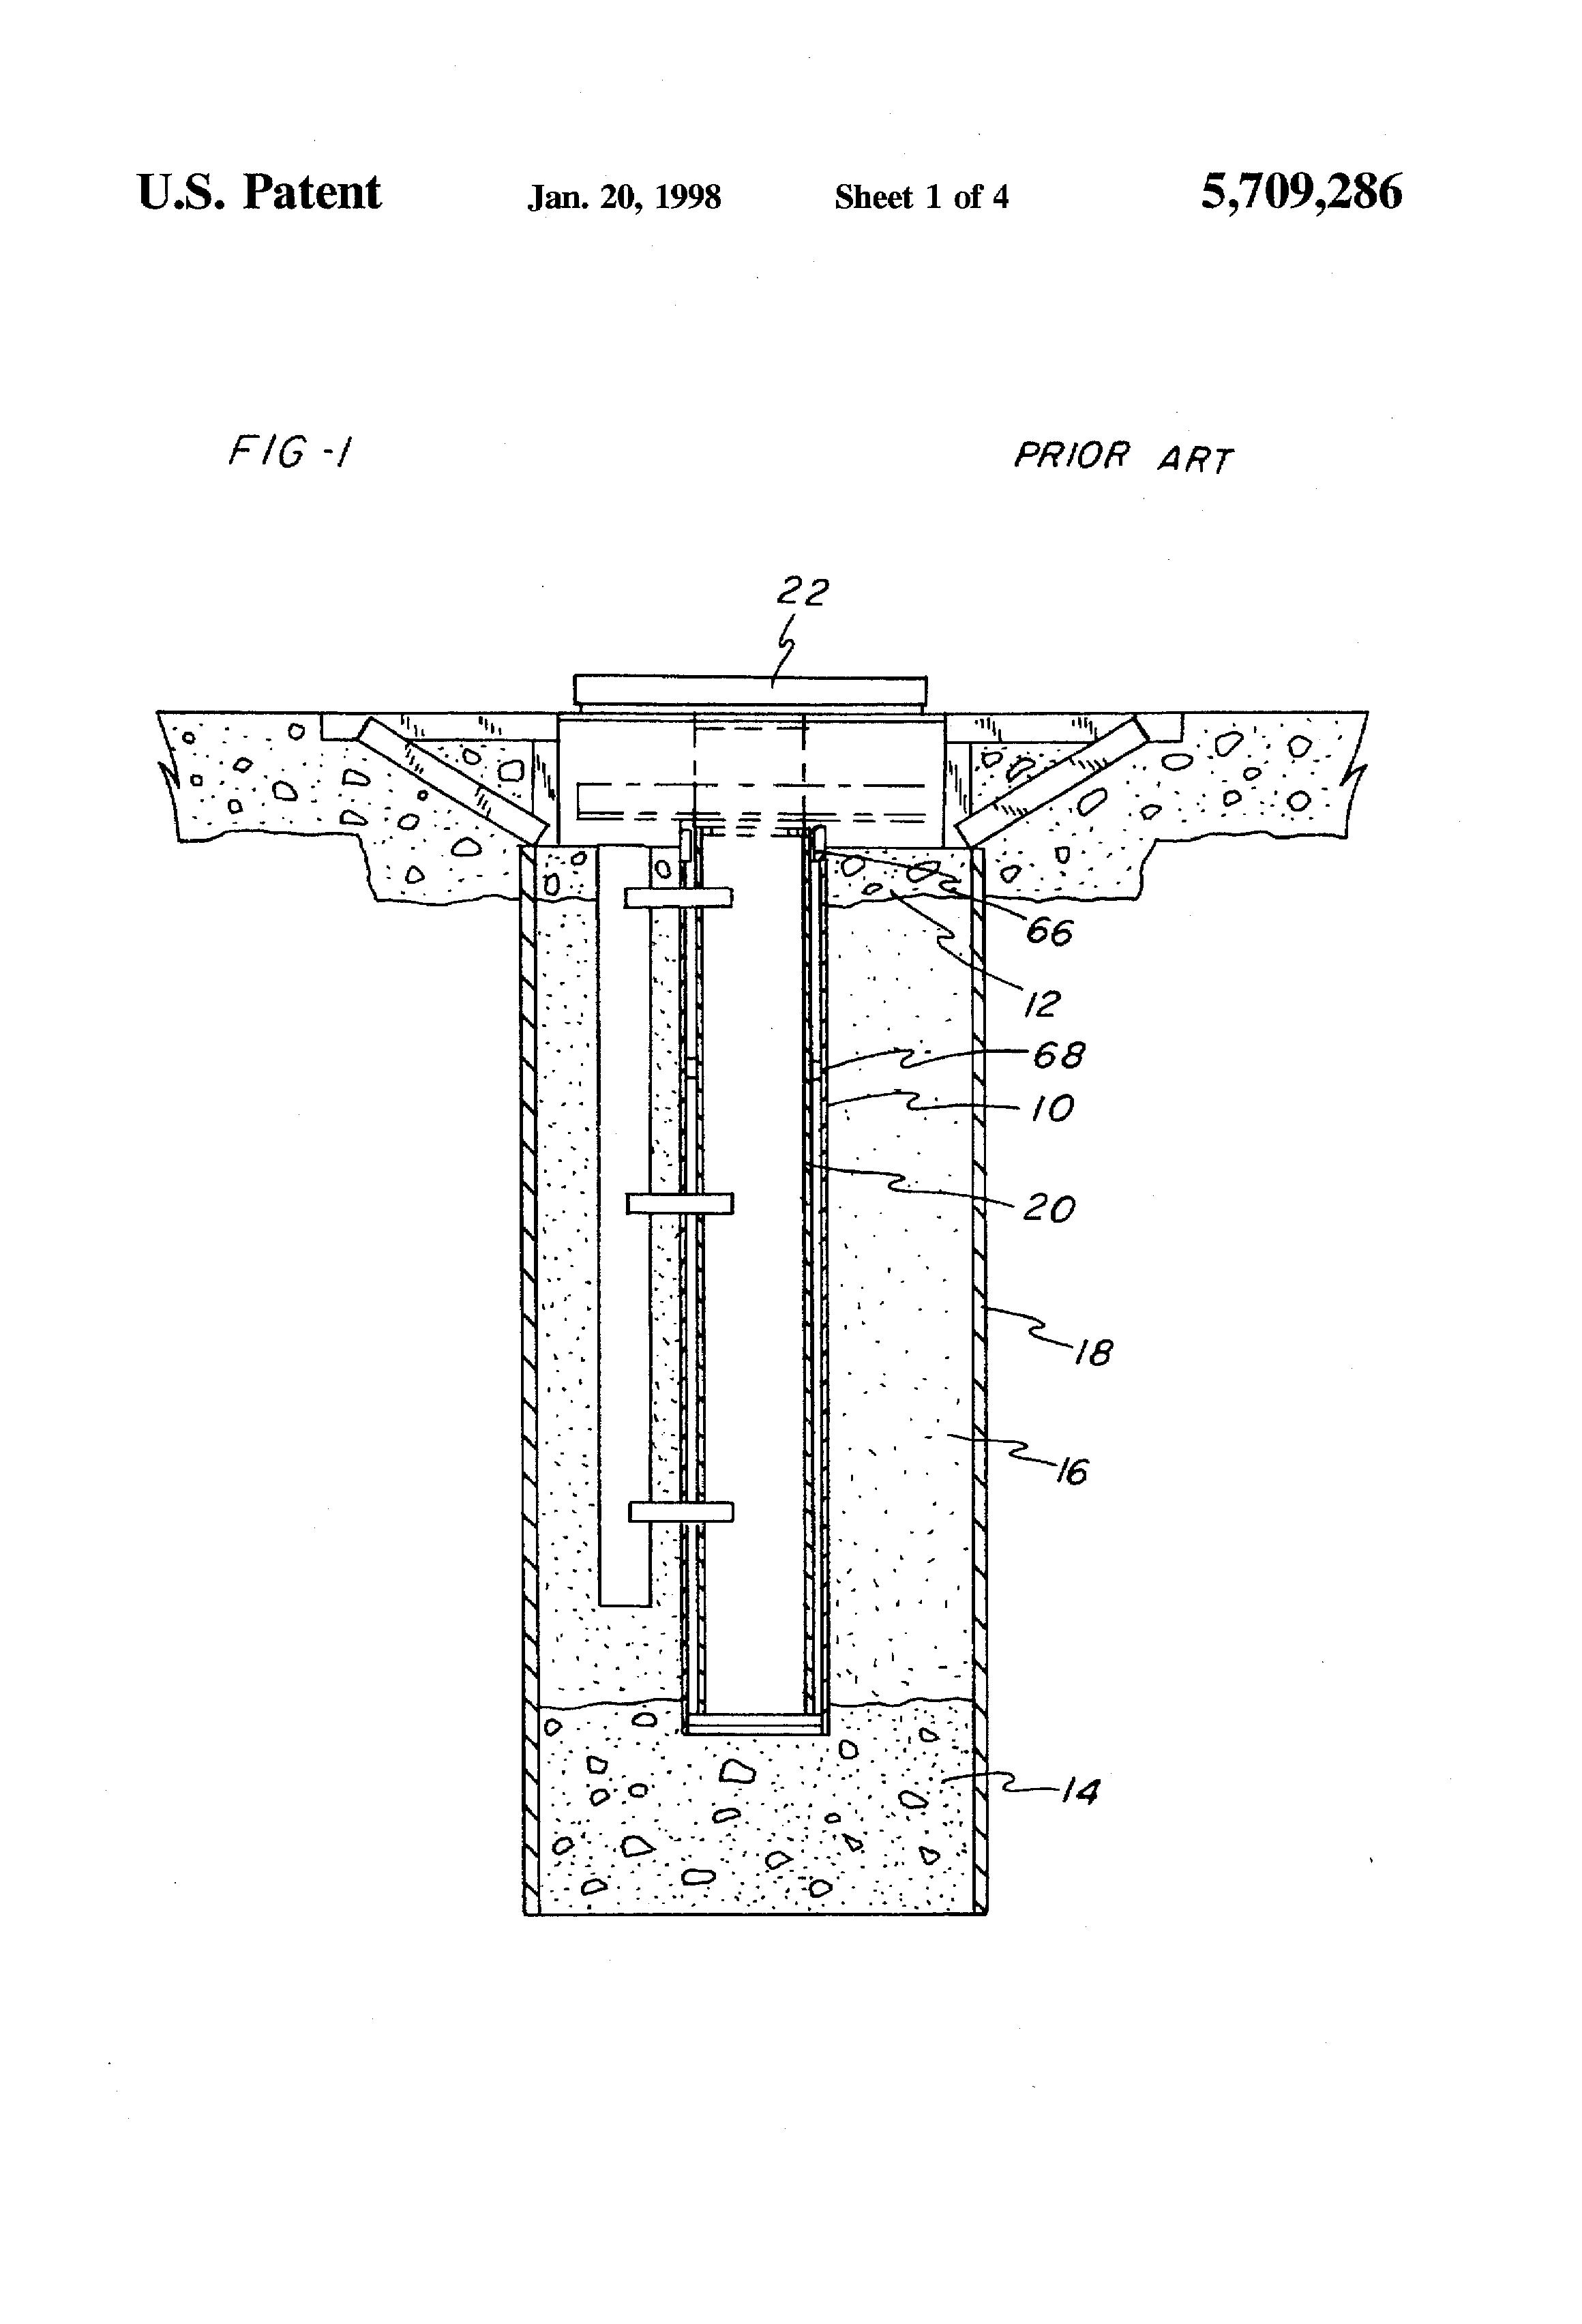 In Ground Hydraulic Lift Diagram